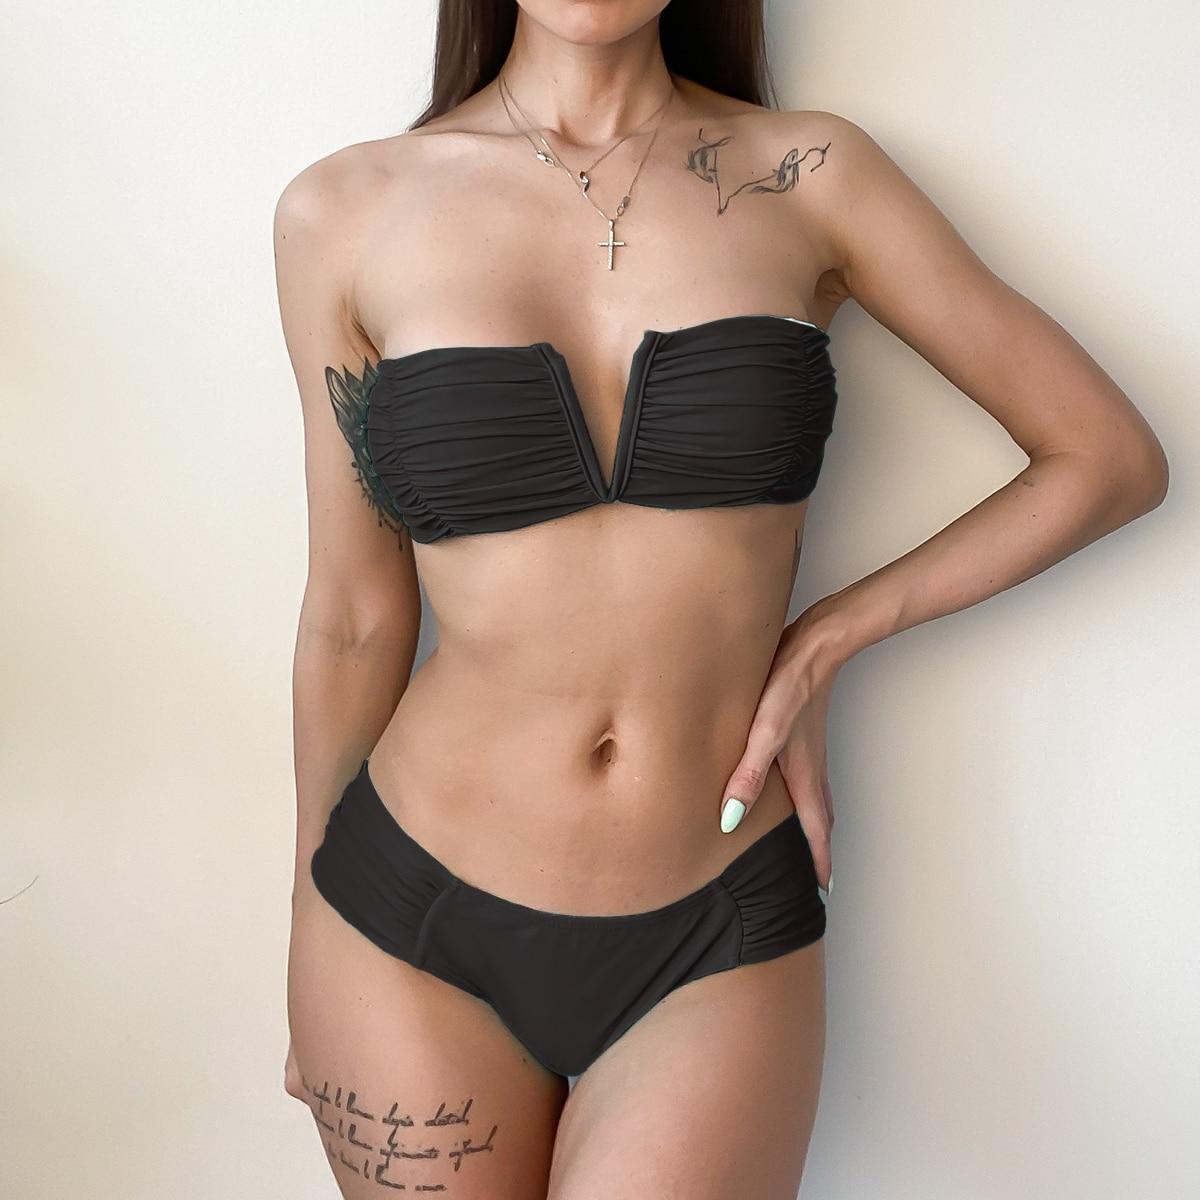 DJC313702-Women Sexy Bikini High Waist Swimsuit